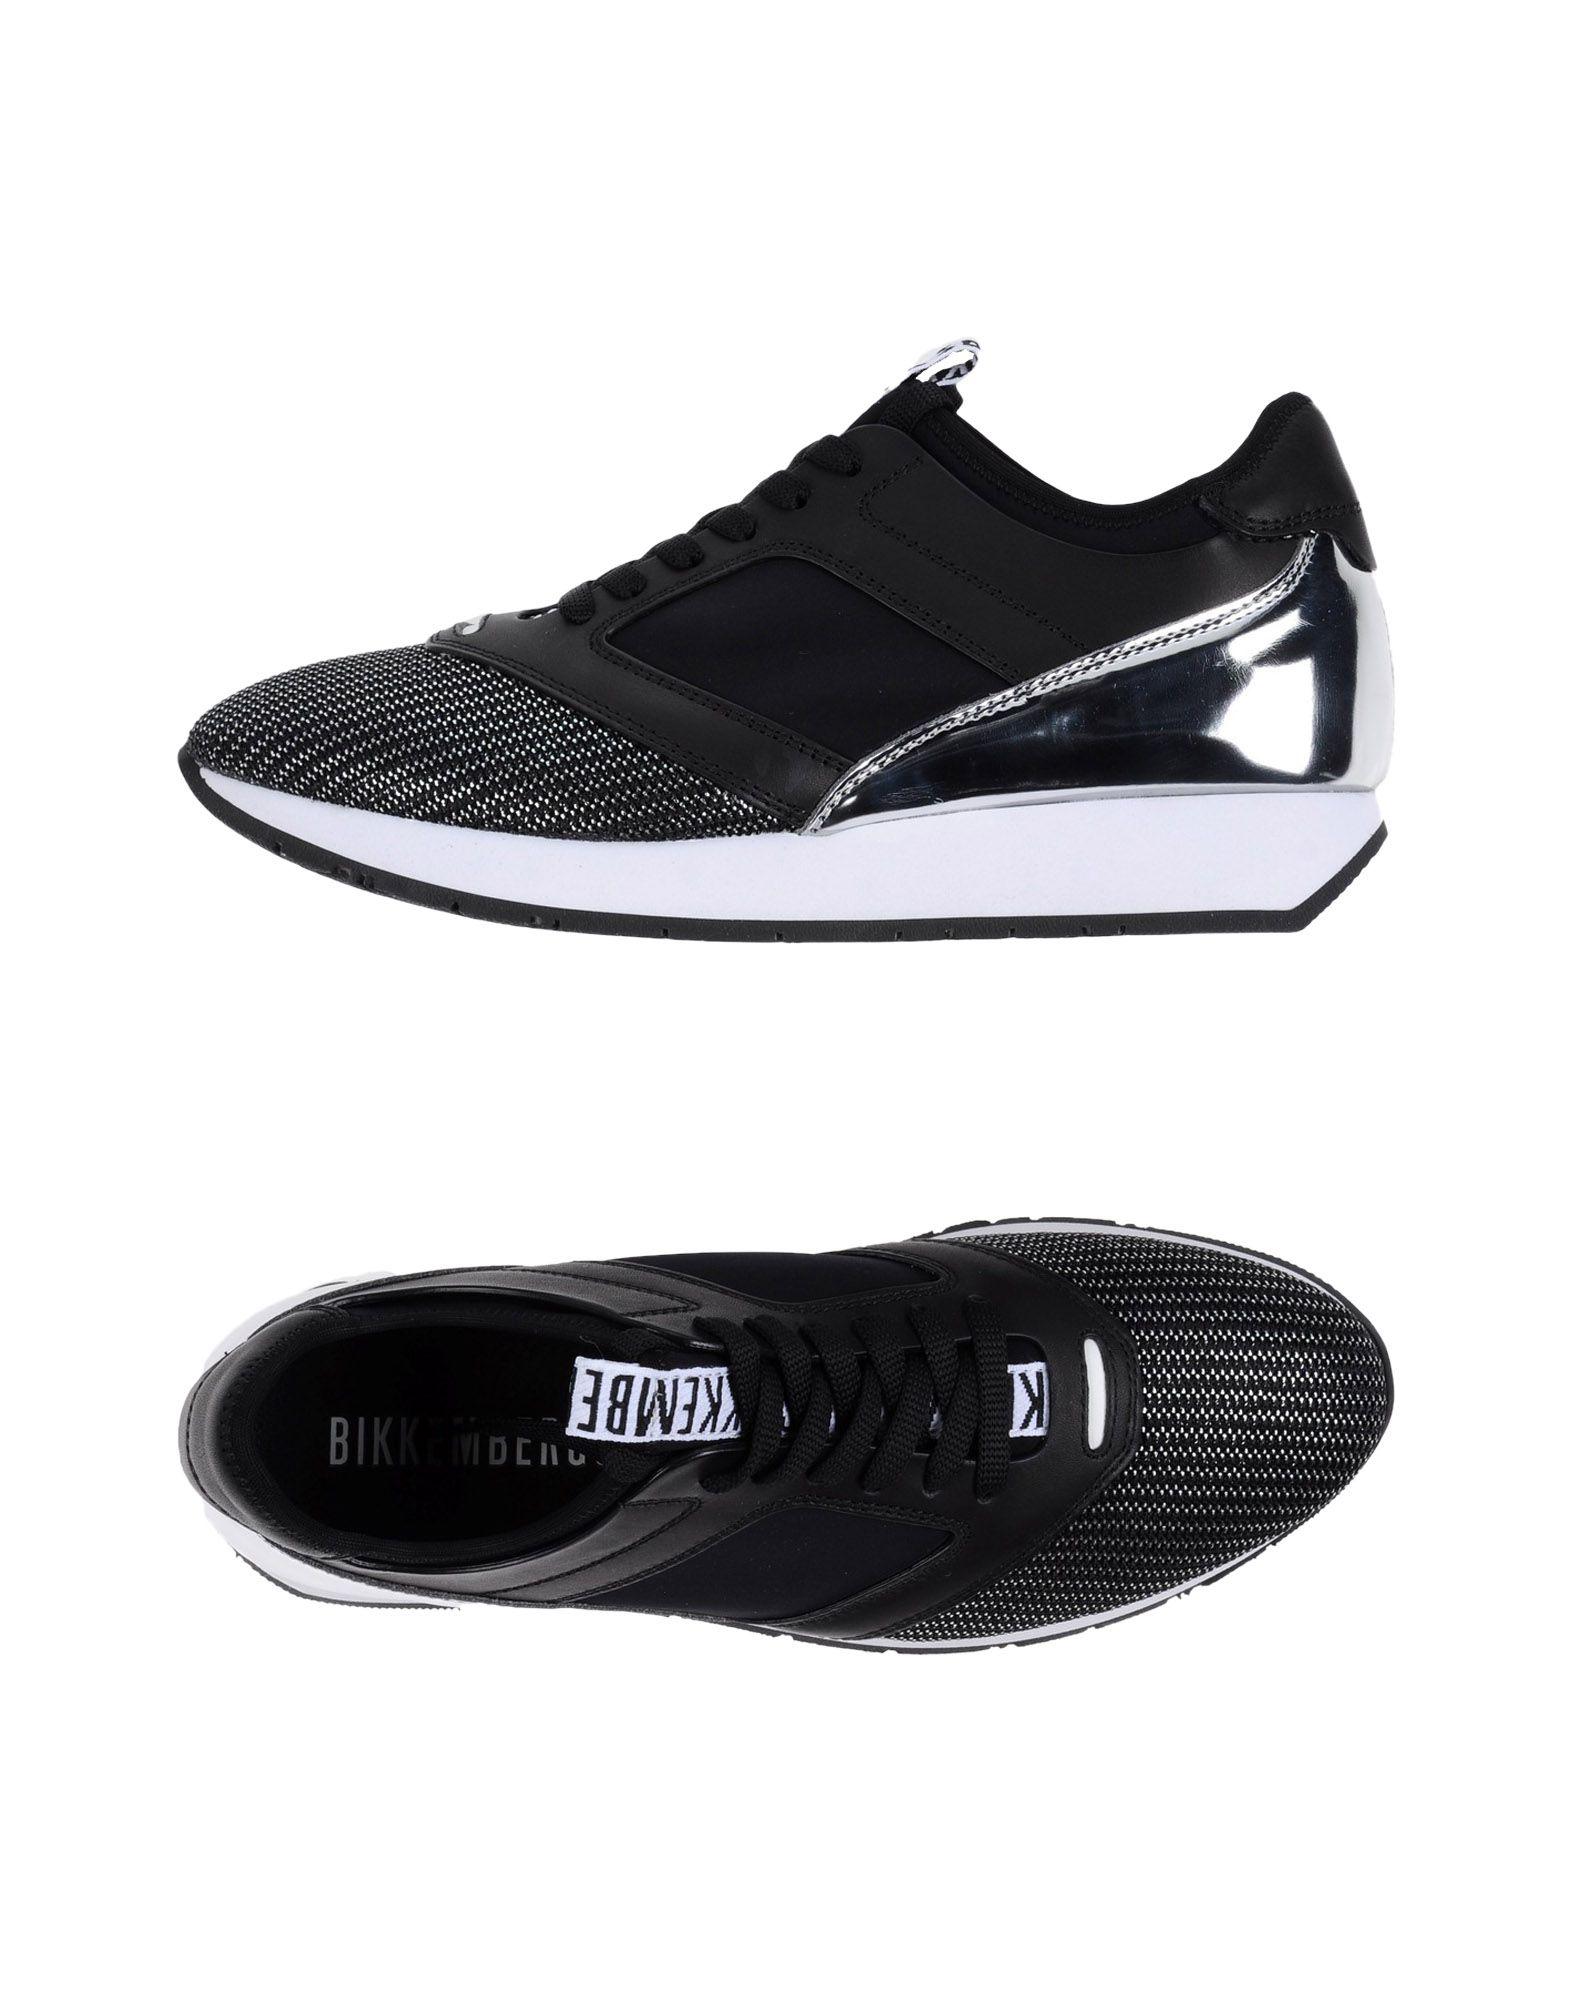 Bikkembergs on Sneakers - Women Bikkembergs Sneakers online on Bikkembergs  Australia - 11141653LS 4f1ea8